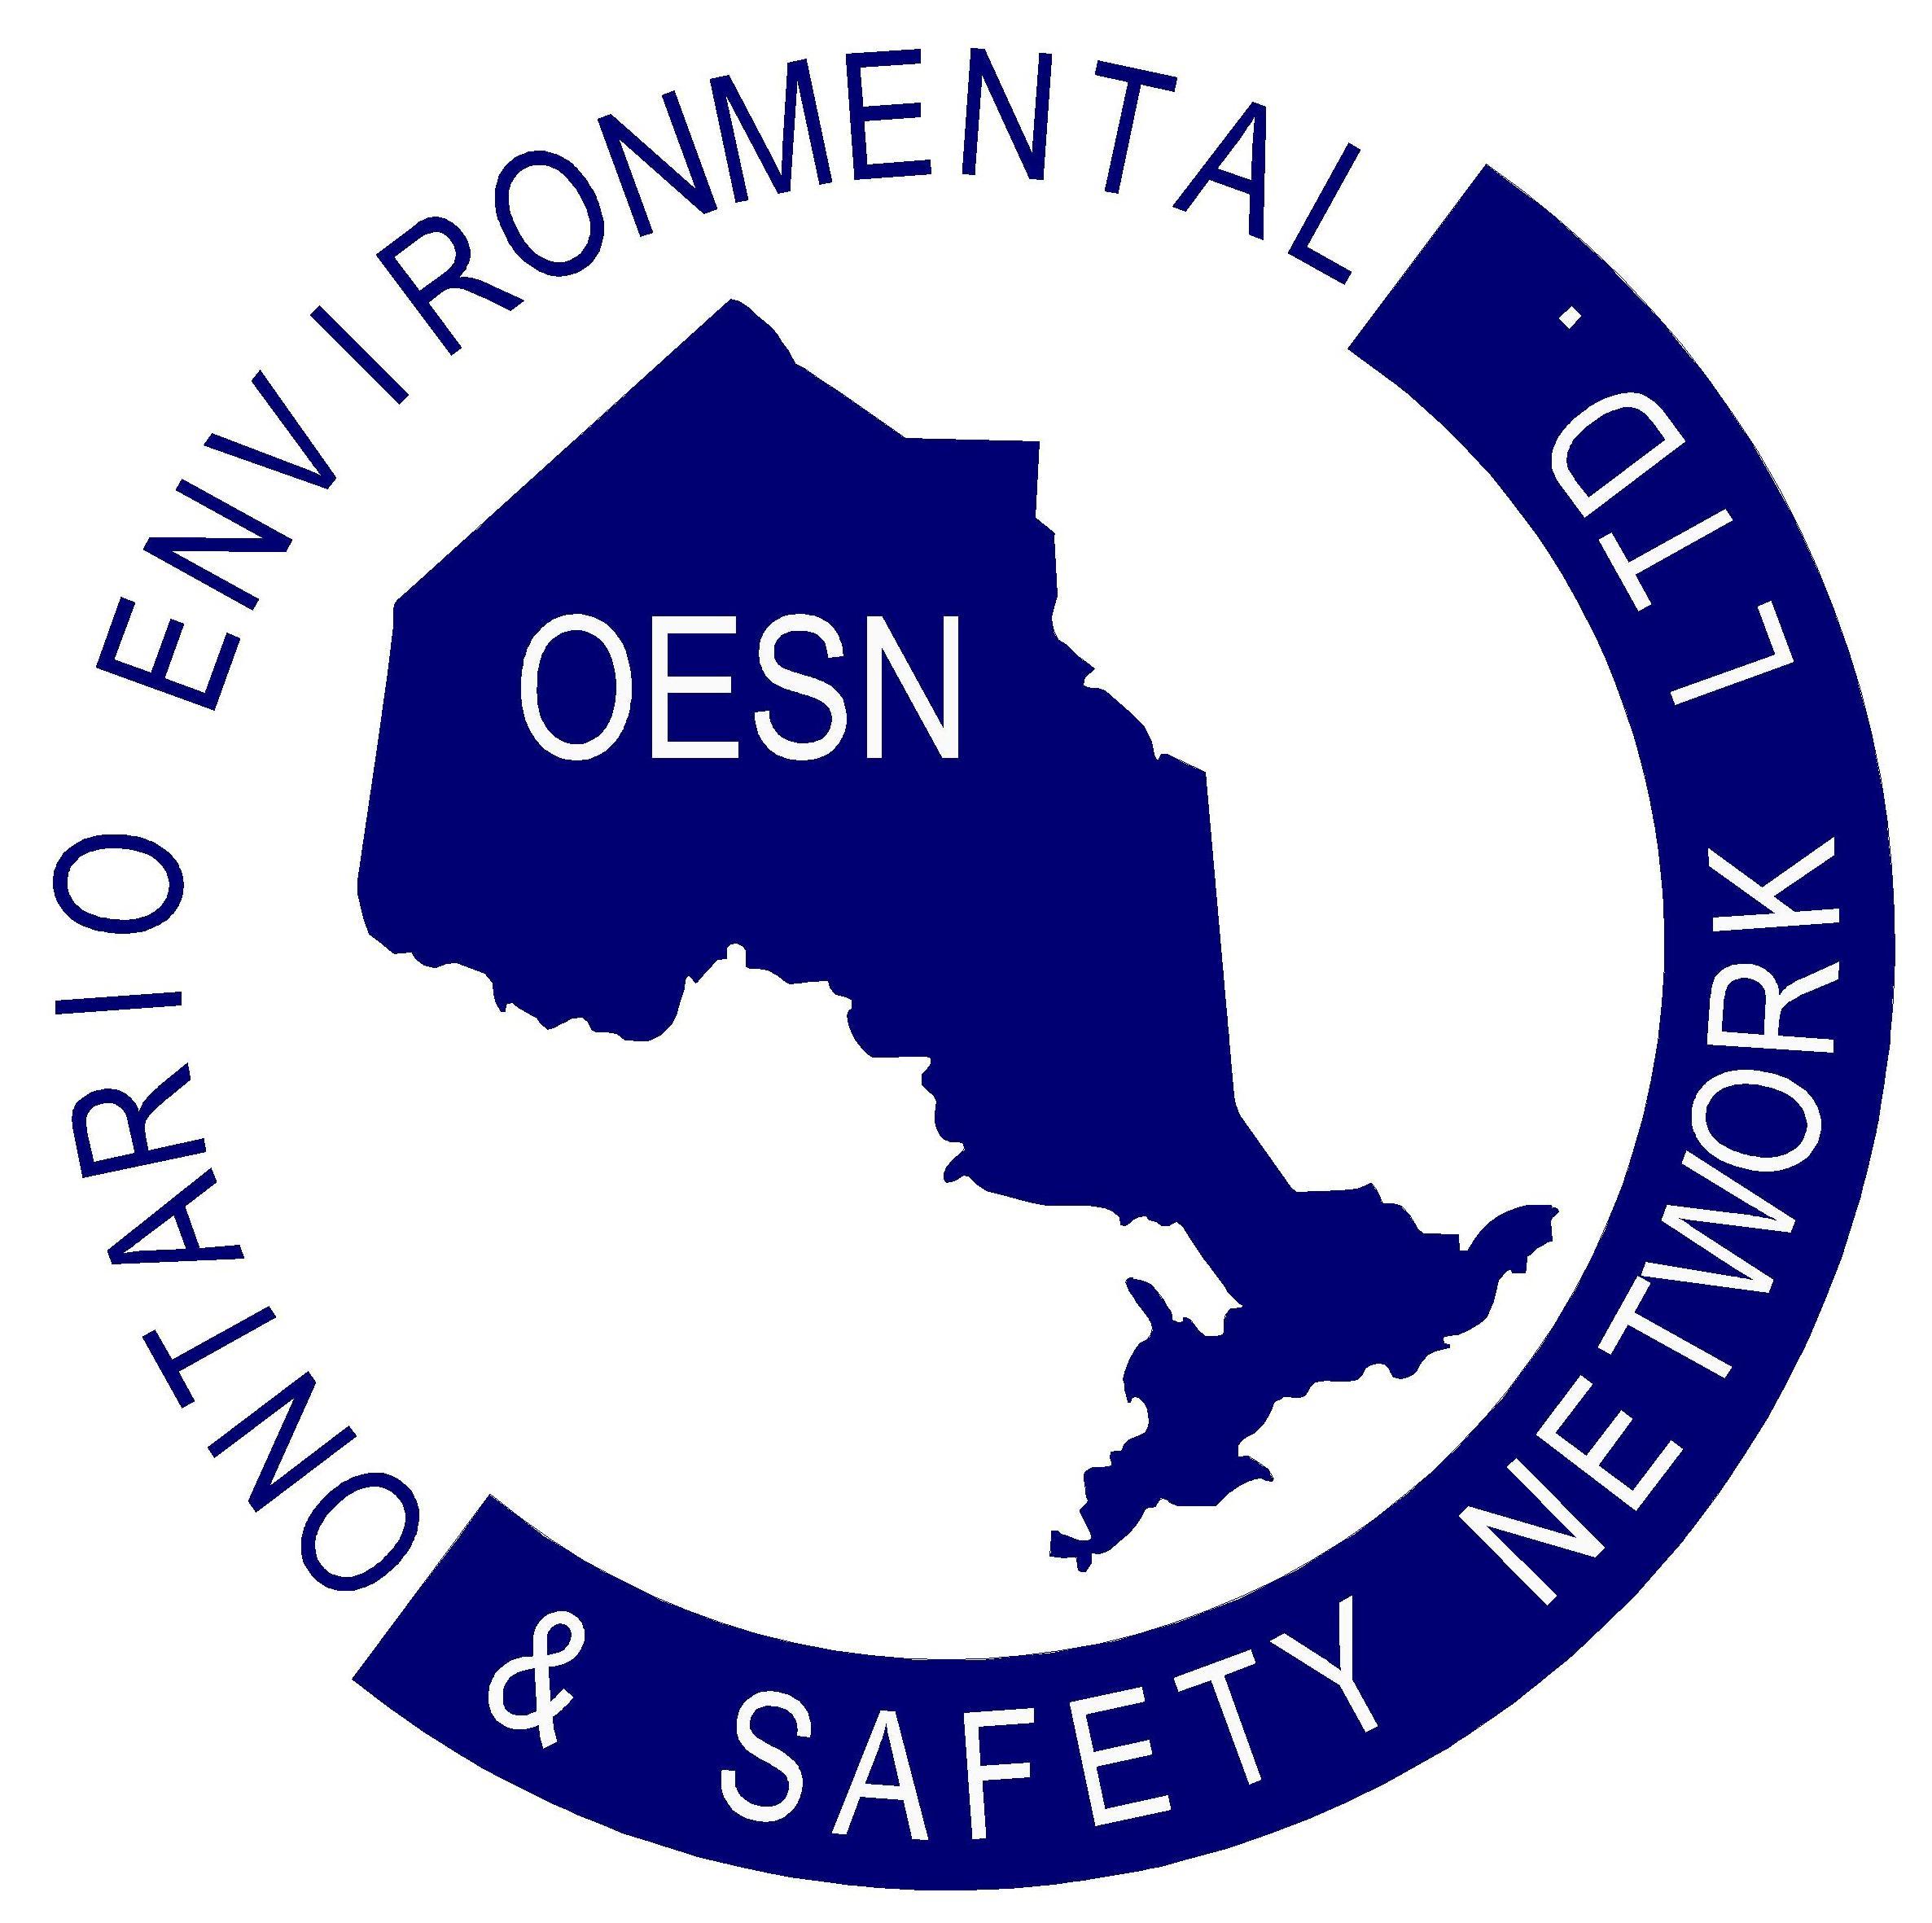 Ontario Environmental & Safety Network Ltd.